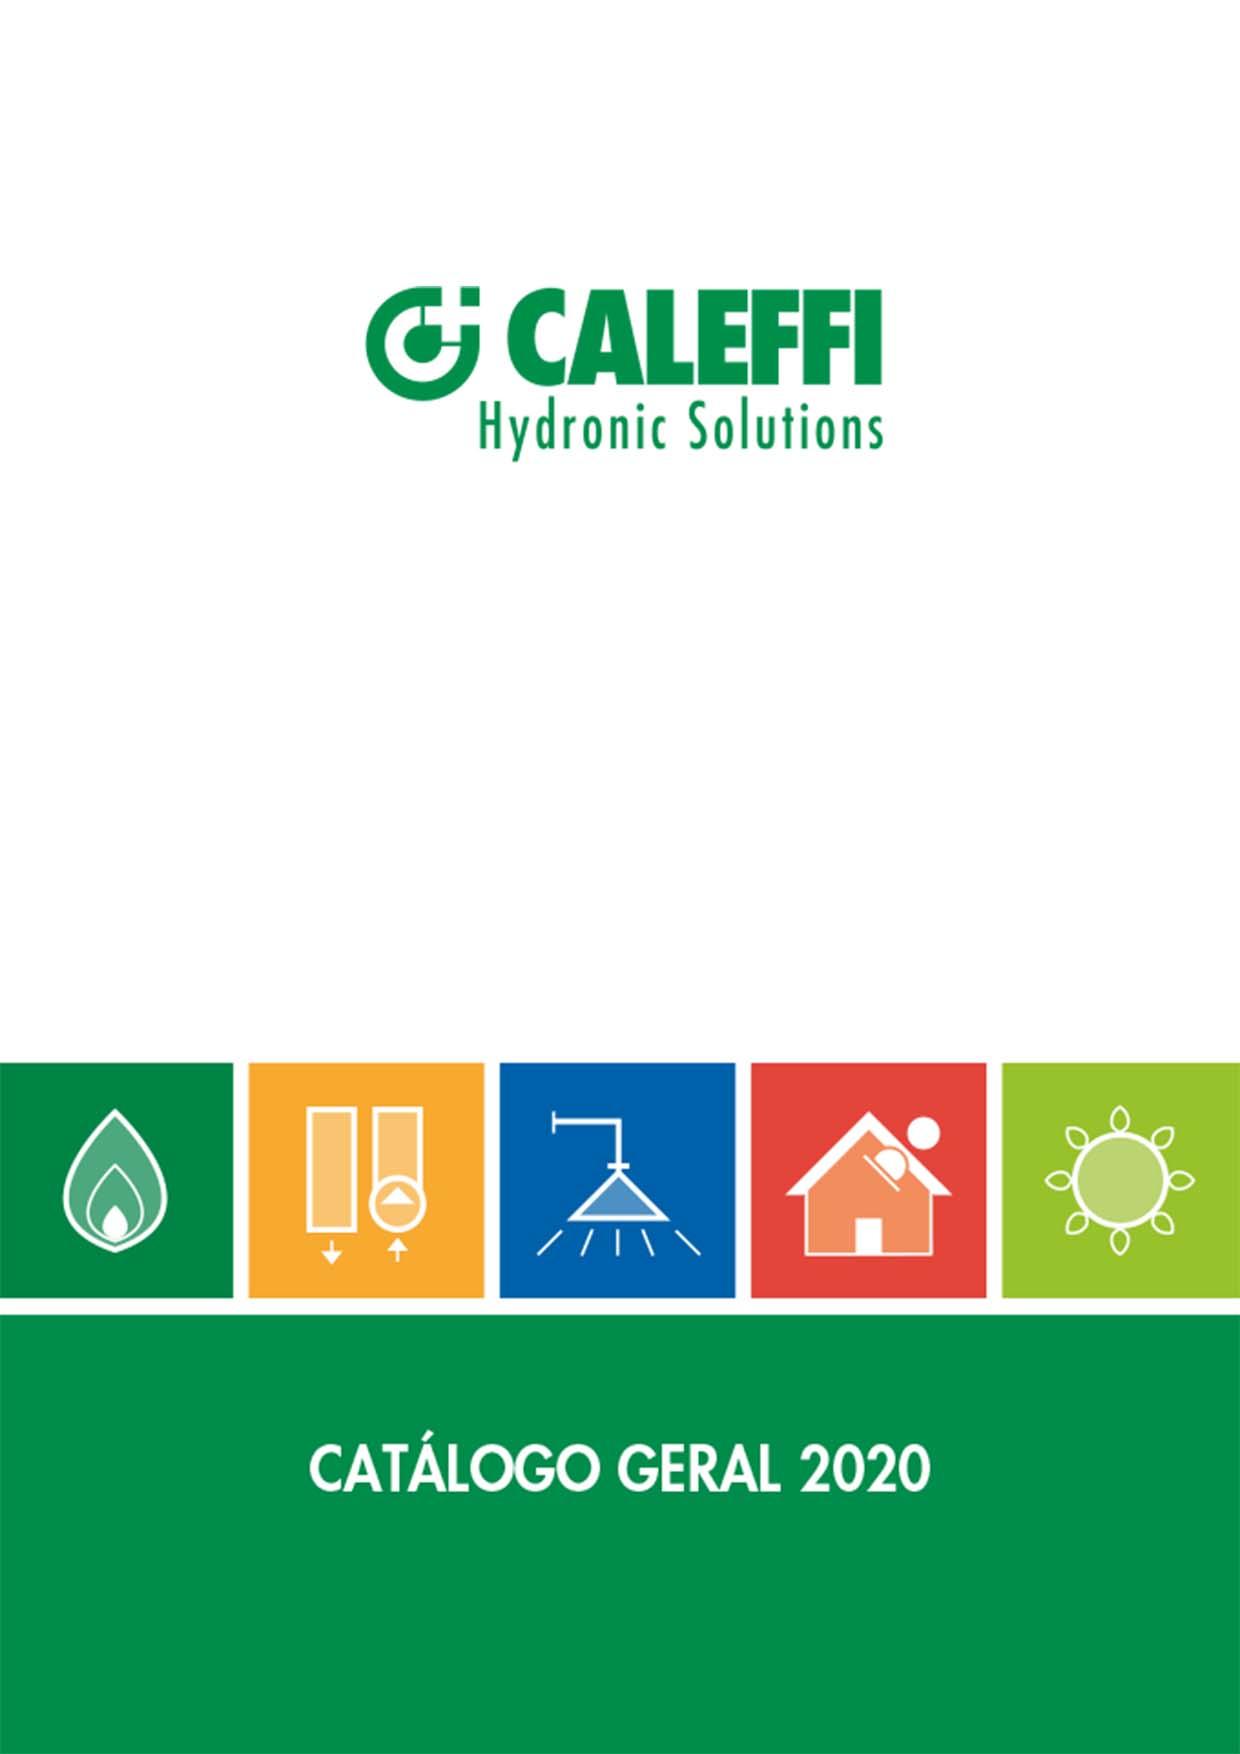 Tabela Caleffi 2020